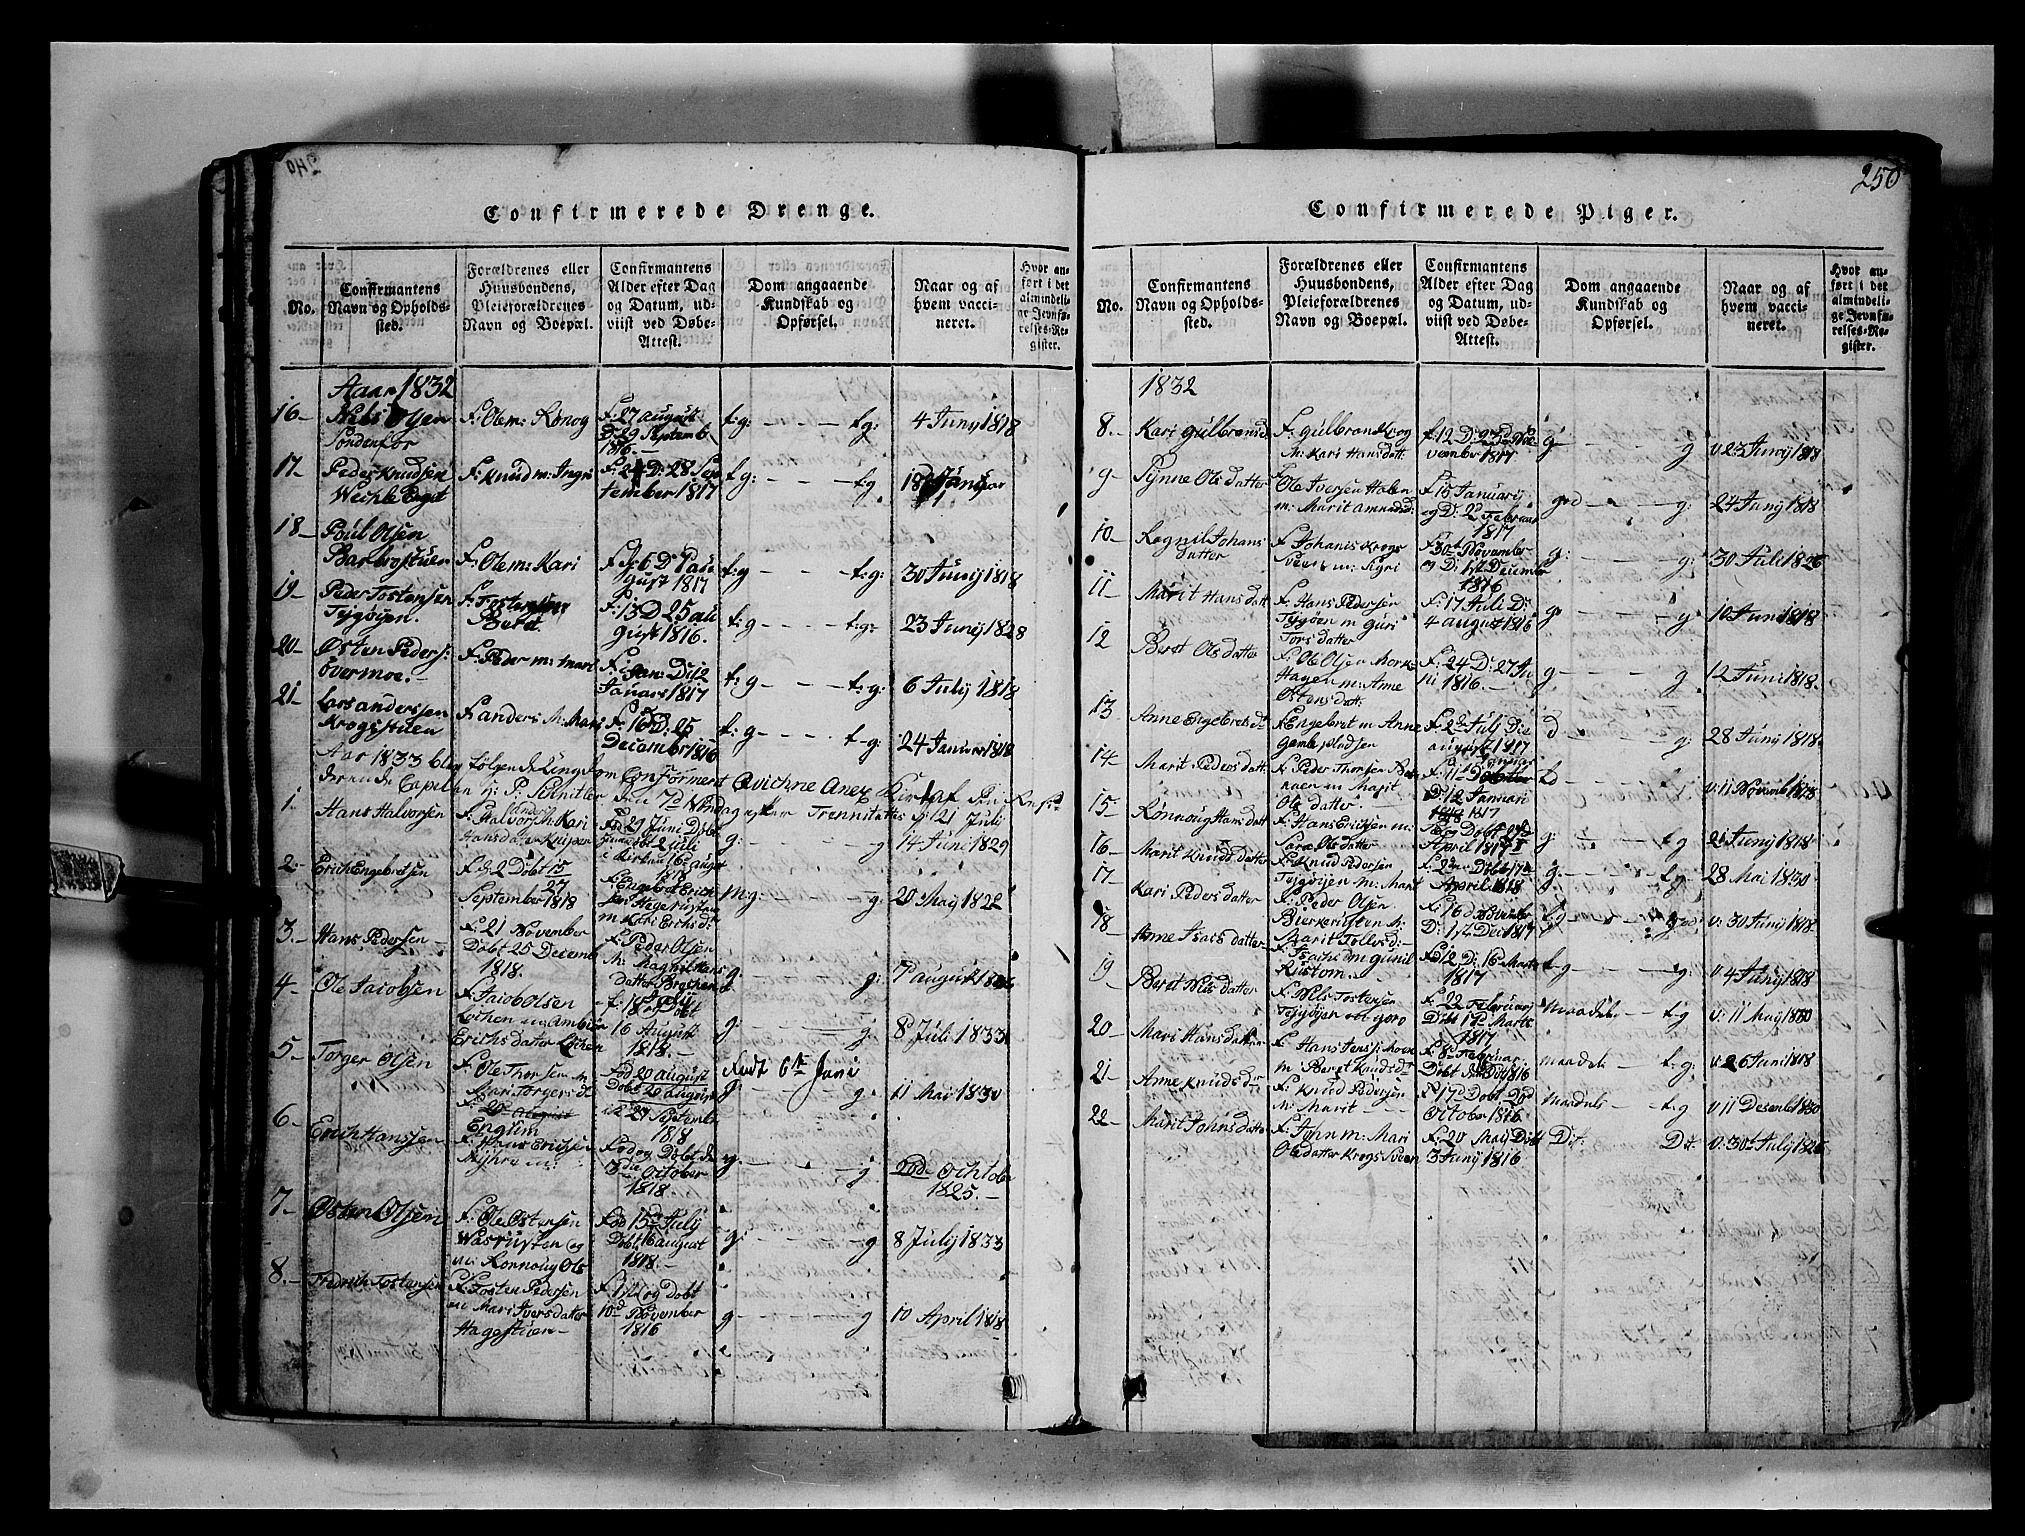 SAH, Fron prestekontor, H/Ha/Hab/L0002: Klokkerbok nr. 2, 1816-1850, s. 250